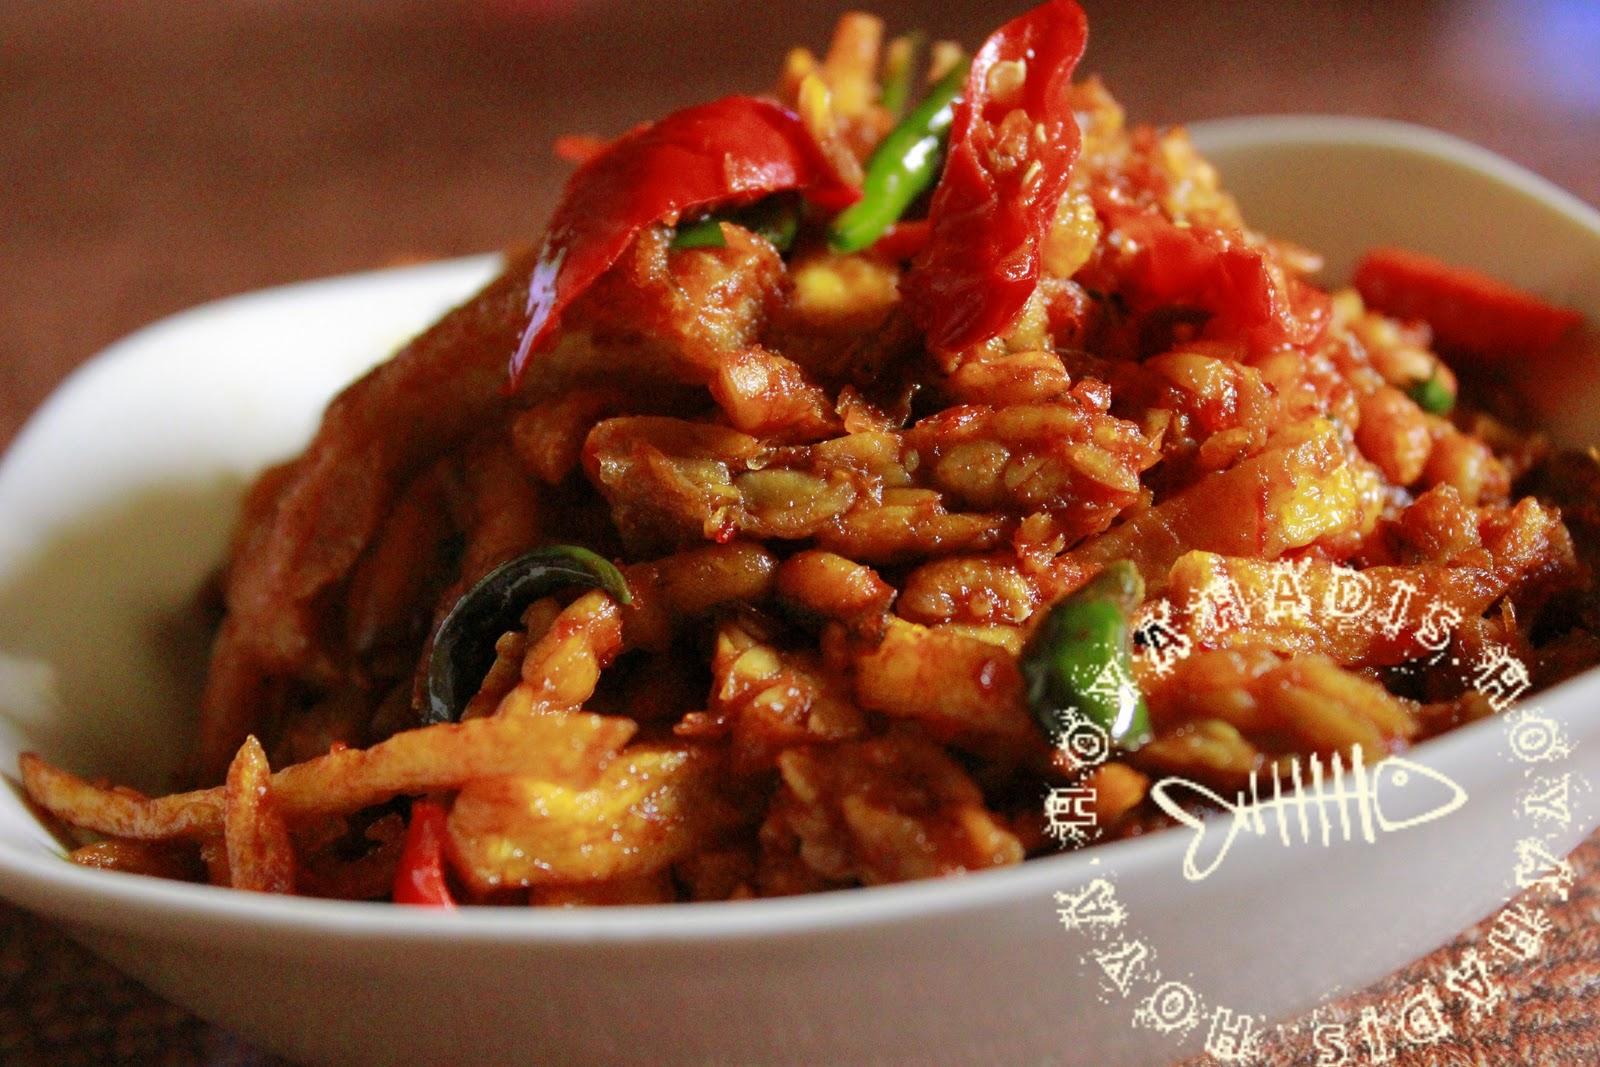 Resepi - Sambal goreng tempe